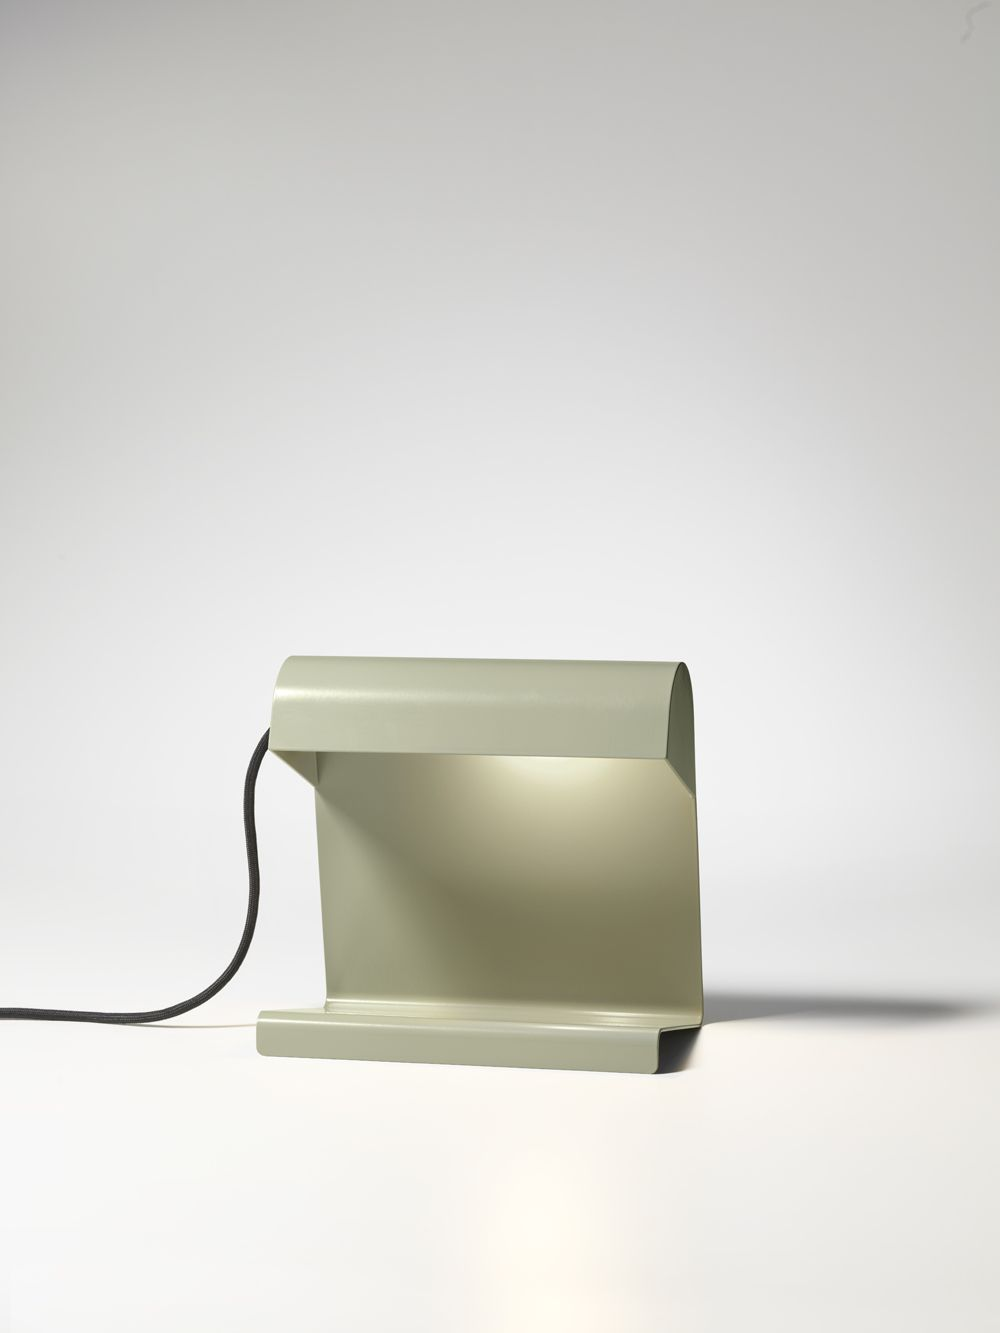 Design Revival Vitra S Prouve Raw Office Edition At Orgatec 2014 By Vitra Archiexpo Lampe De Bureau Luminaire Lampe